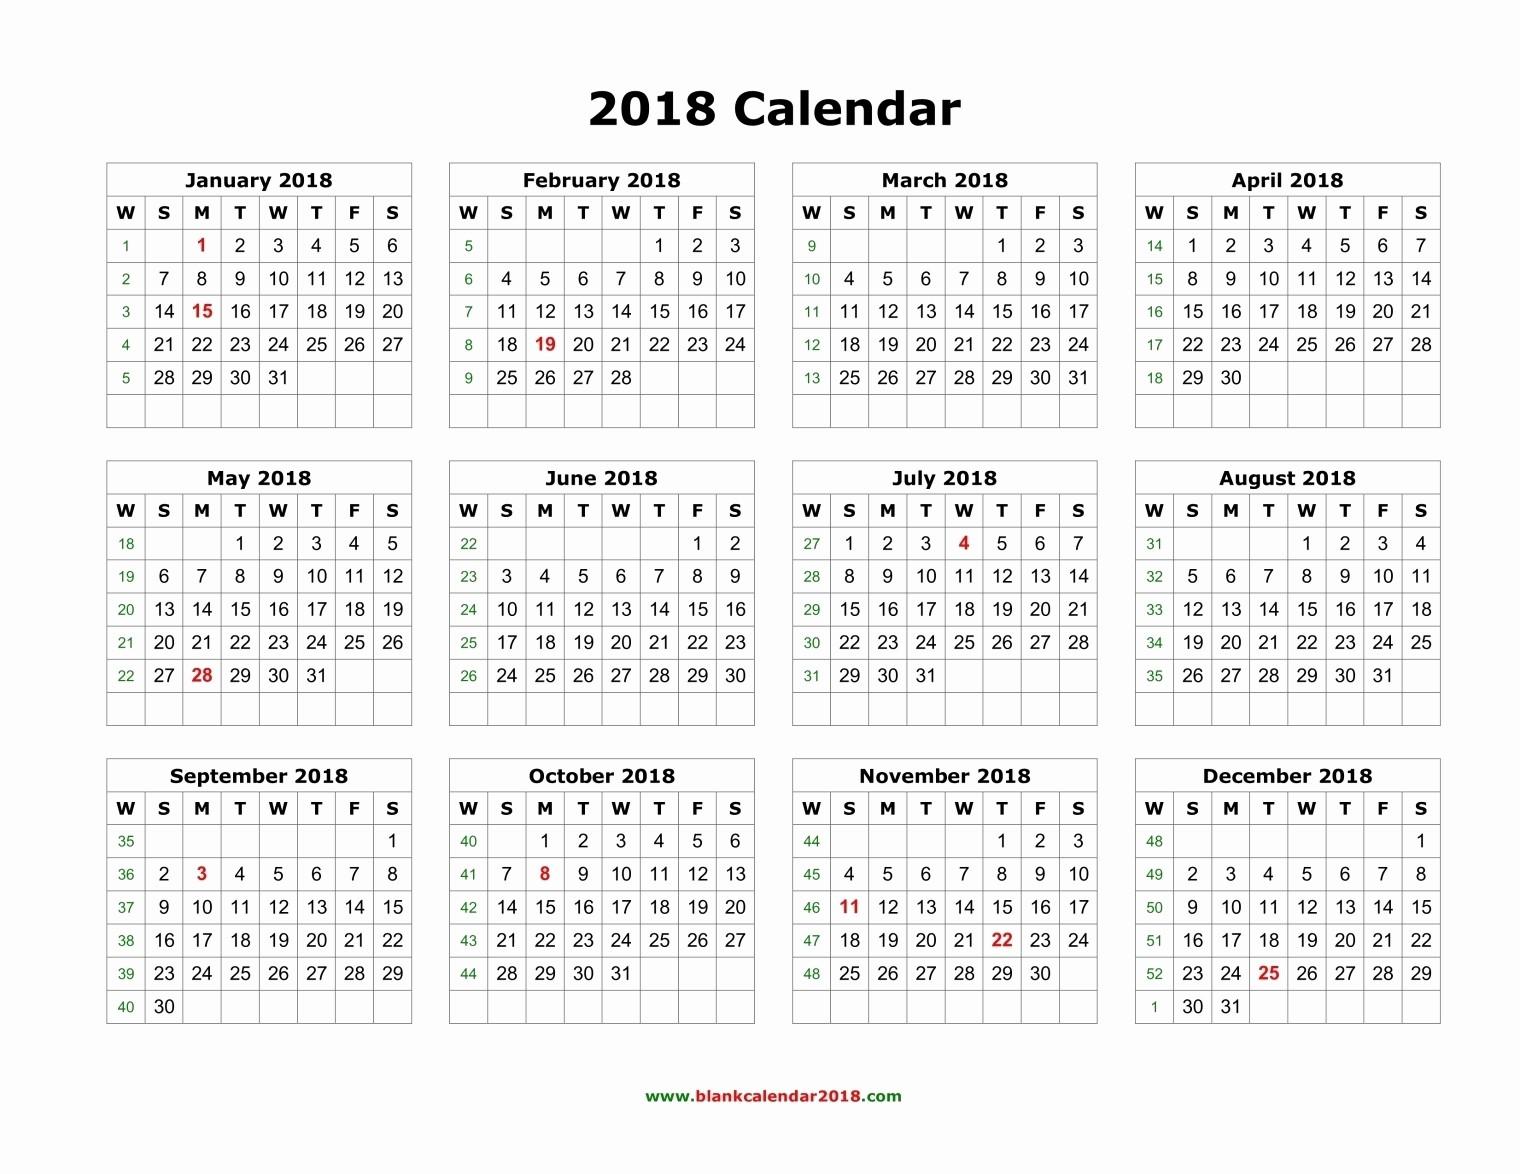 12 Month Calendar 2018 Printable Elegant Printable Twelve Month Calendar 2018 Two Months Per Page